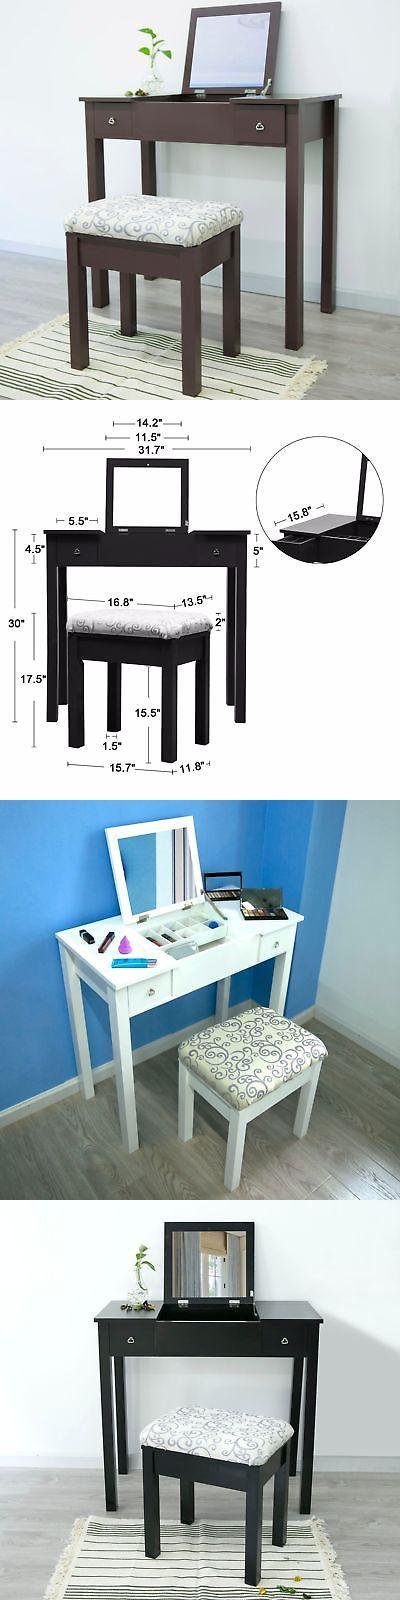 Baby Swings 2990: Vanity Makeup Flip Top Mirror Drawers Dressing Table Set W Cushioned Stool -> BUY IT NOW ONLY: $149.99 on eBay!